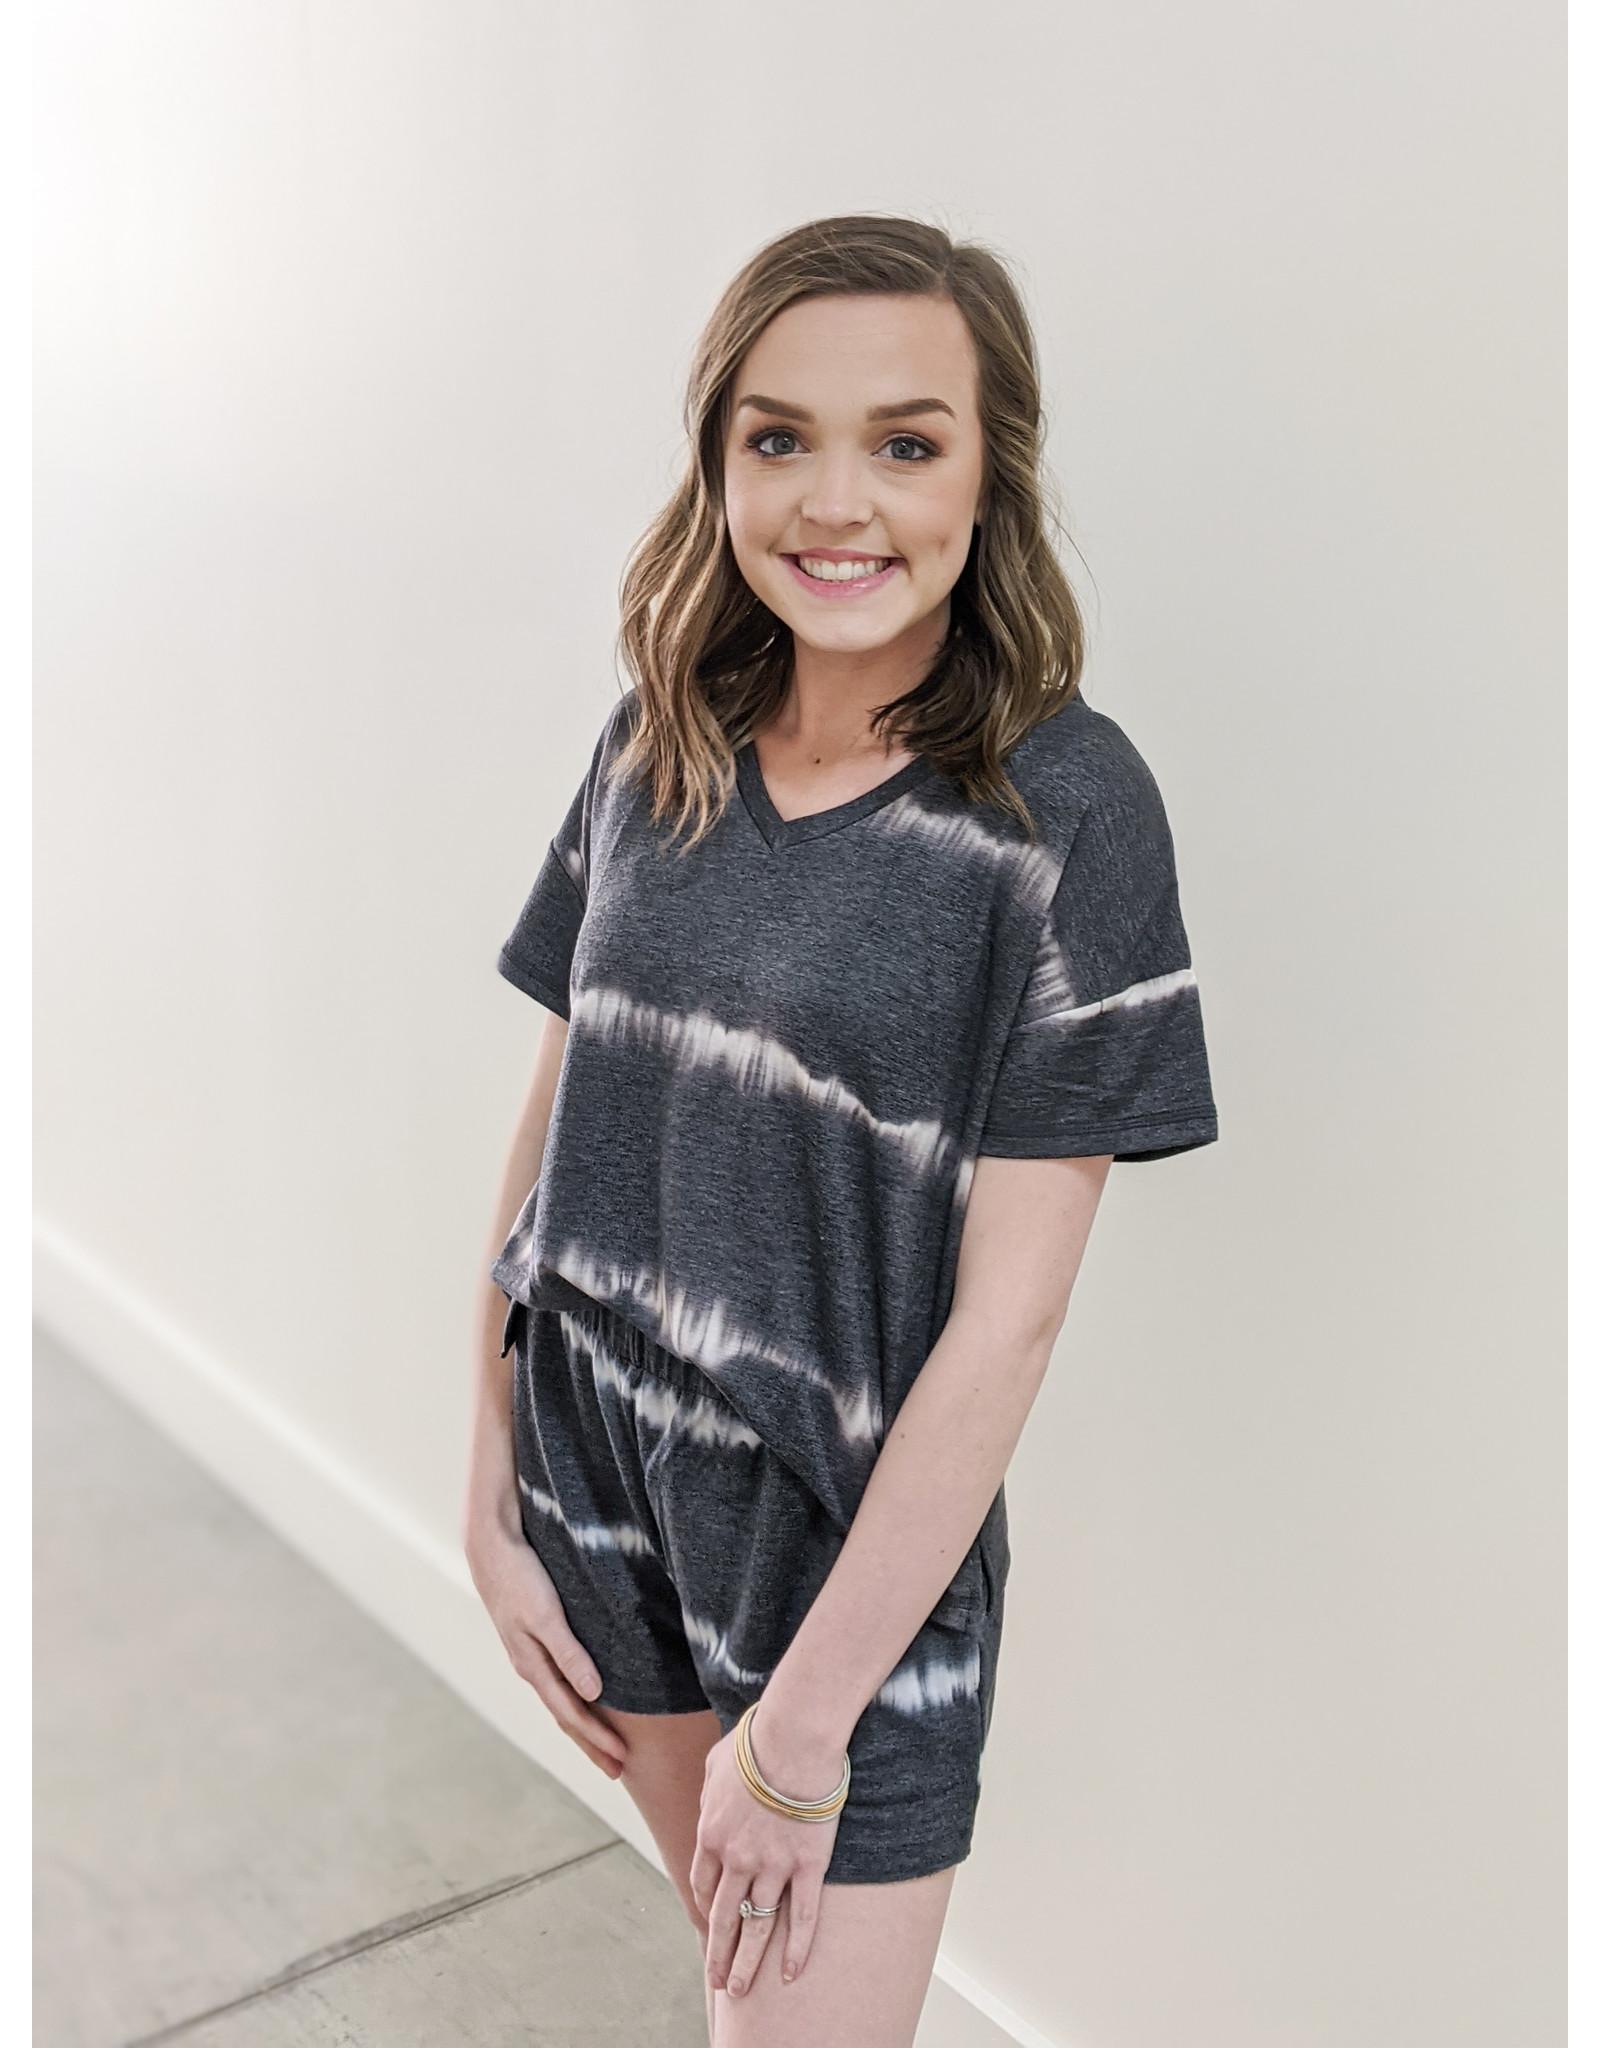 Mary Square Randi Shorts Black Tie Dye